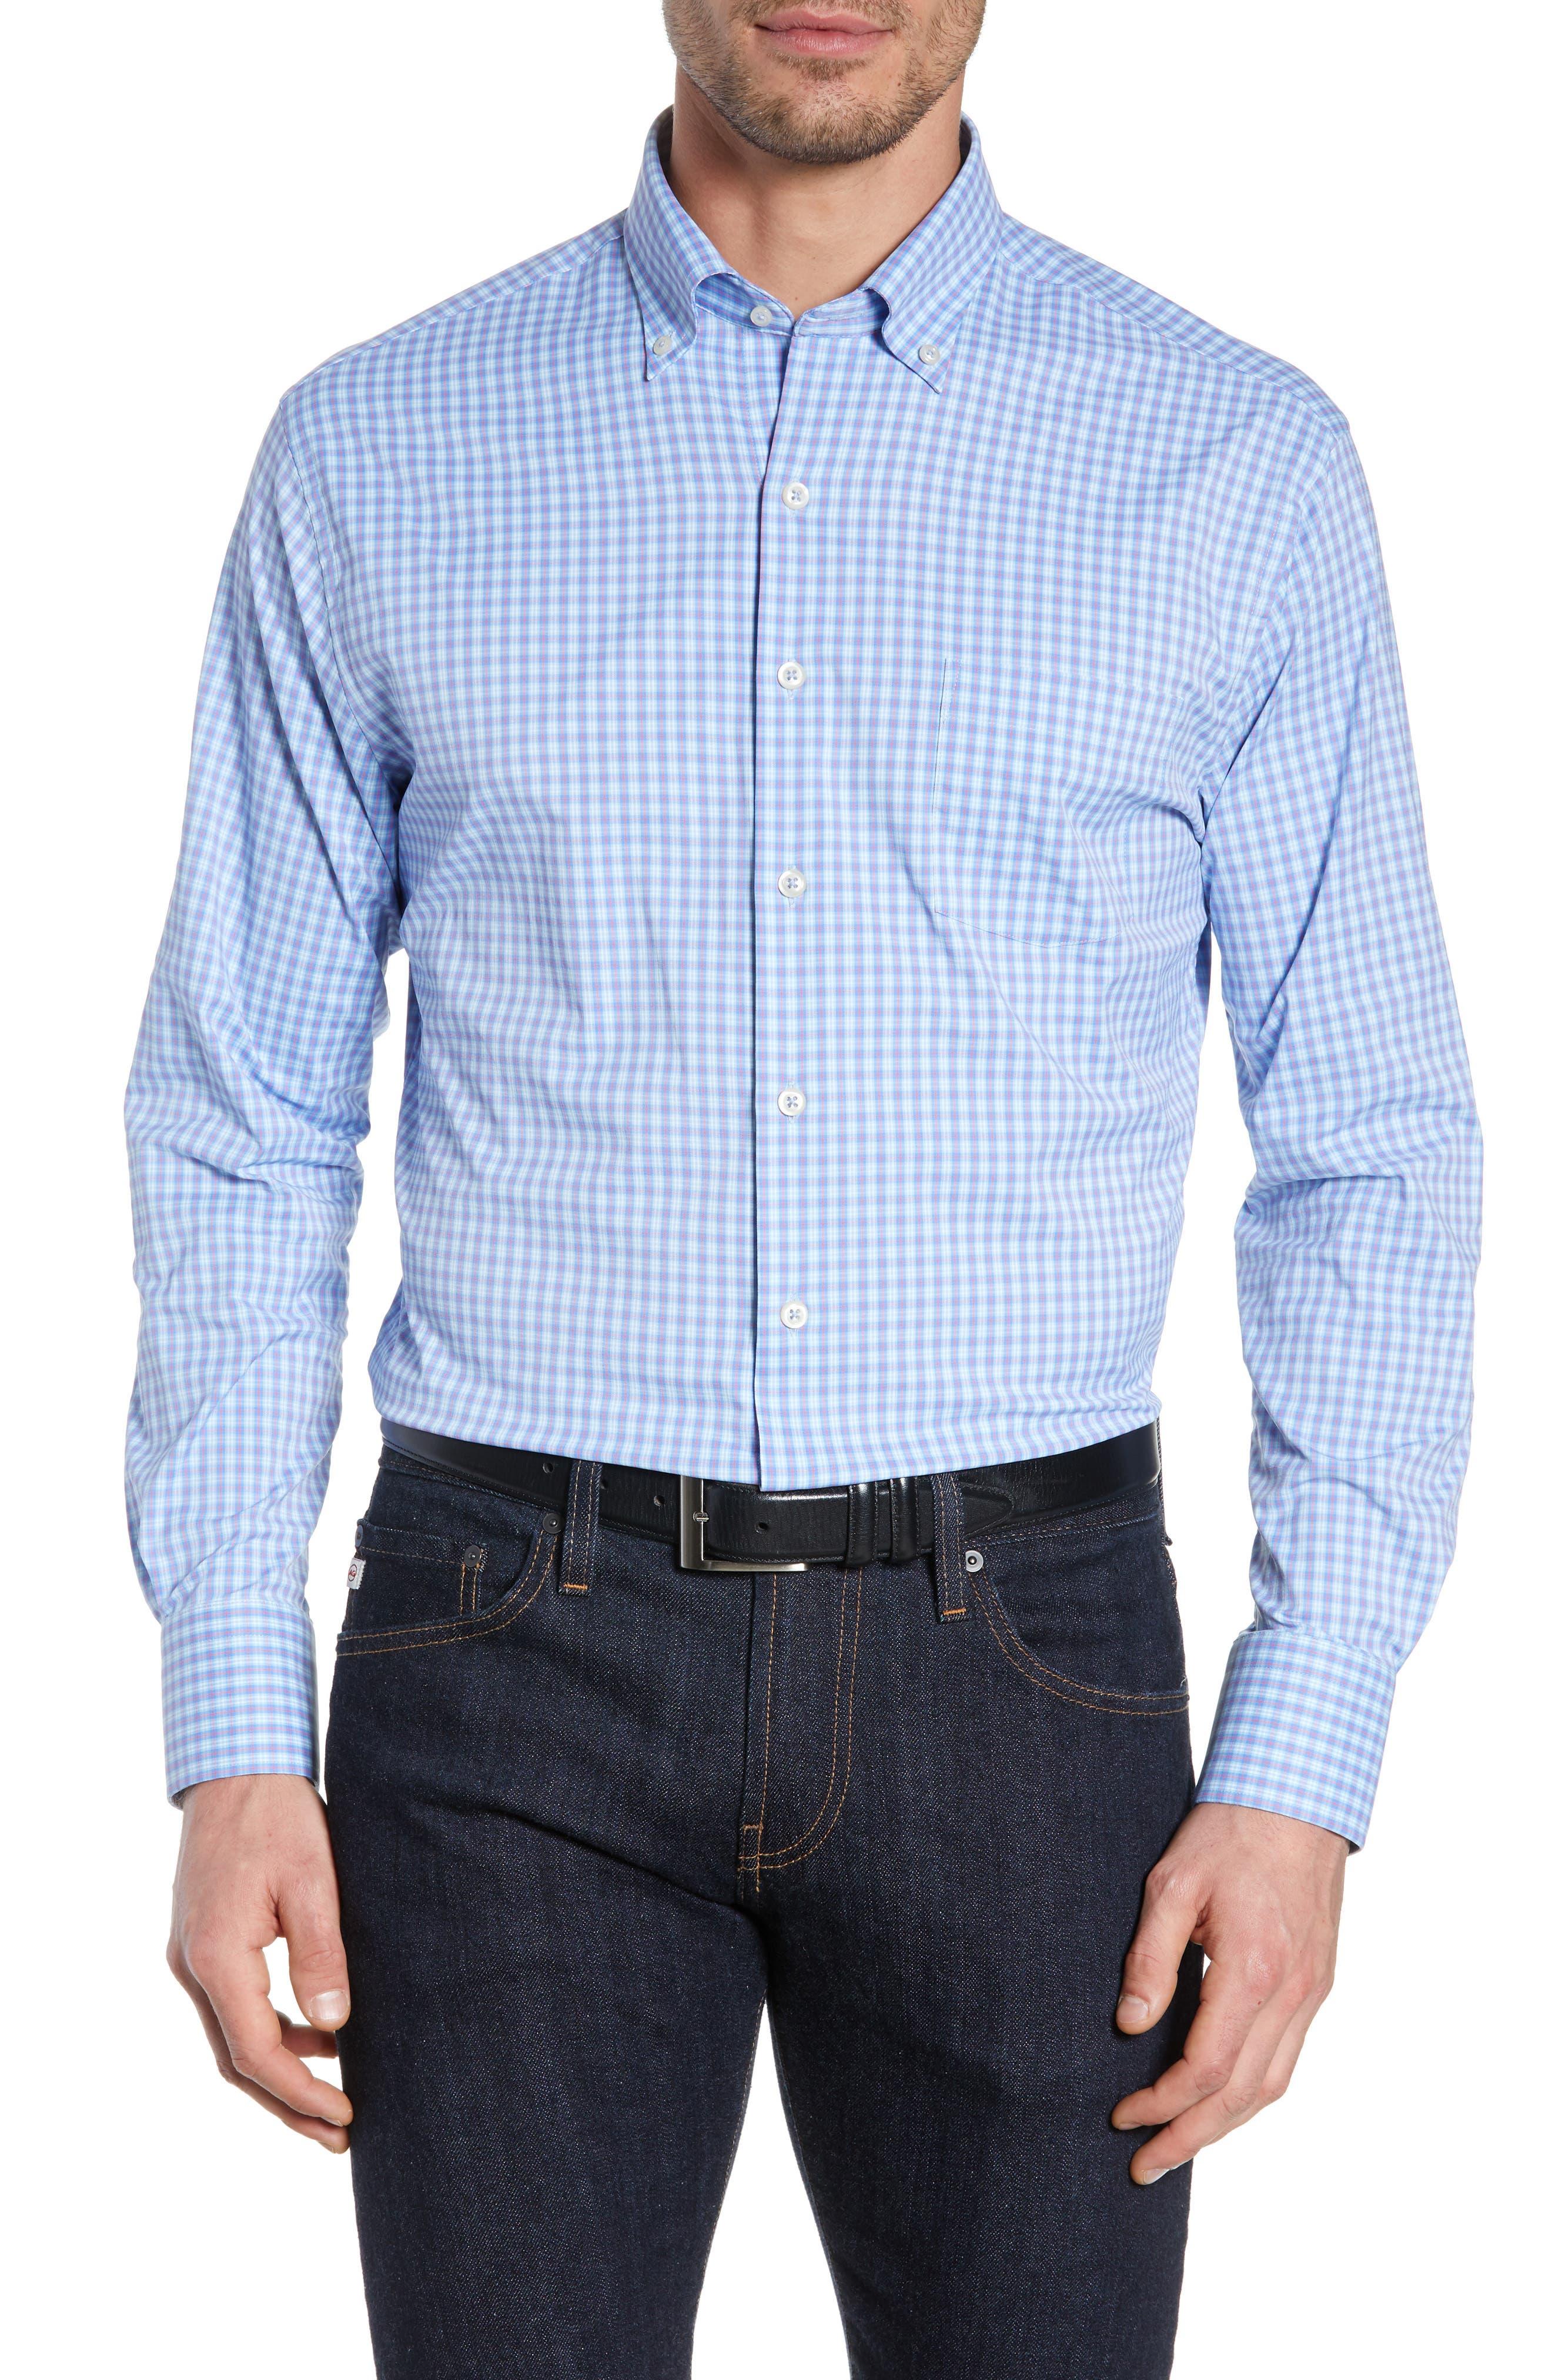 PETER MILLAR Hawkins Plaid Performance Sport Shirt, Main, color, VESSEL